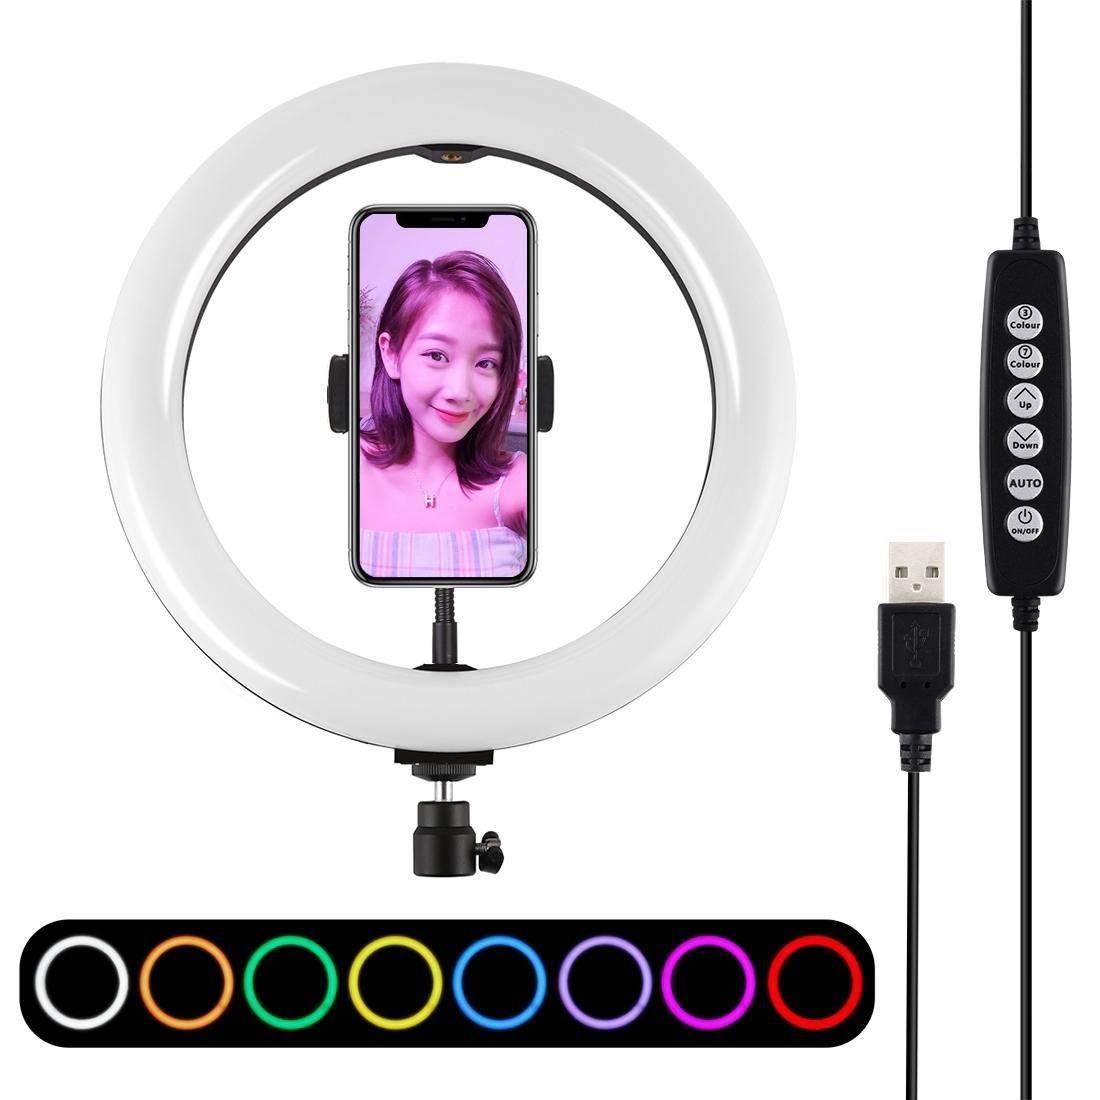 PULUZ 102 بوصة 26cm وUSB 10 وسائط 8 ألوان RGBW عكس الضوء LED الدائري مشاركة في مدونة فيديو أضواء تصوير الفيديو مع حذاء الباردة الكرة ترايبود رئيس الهاتف الكلور